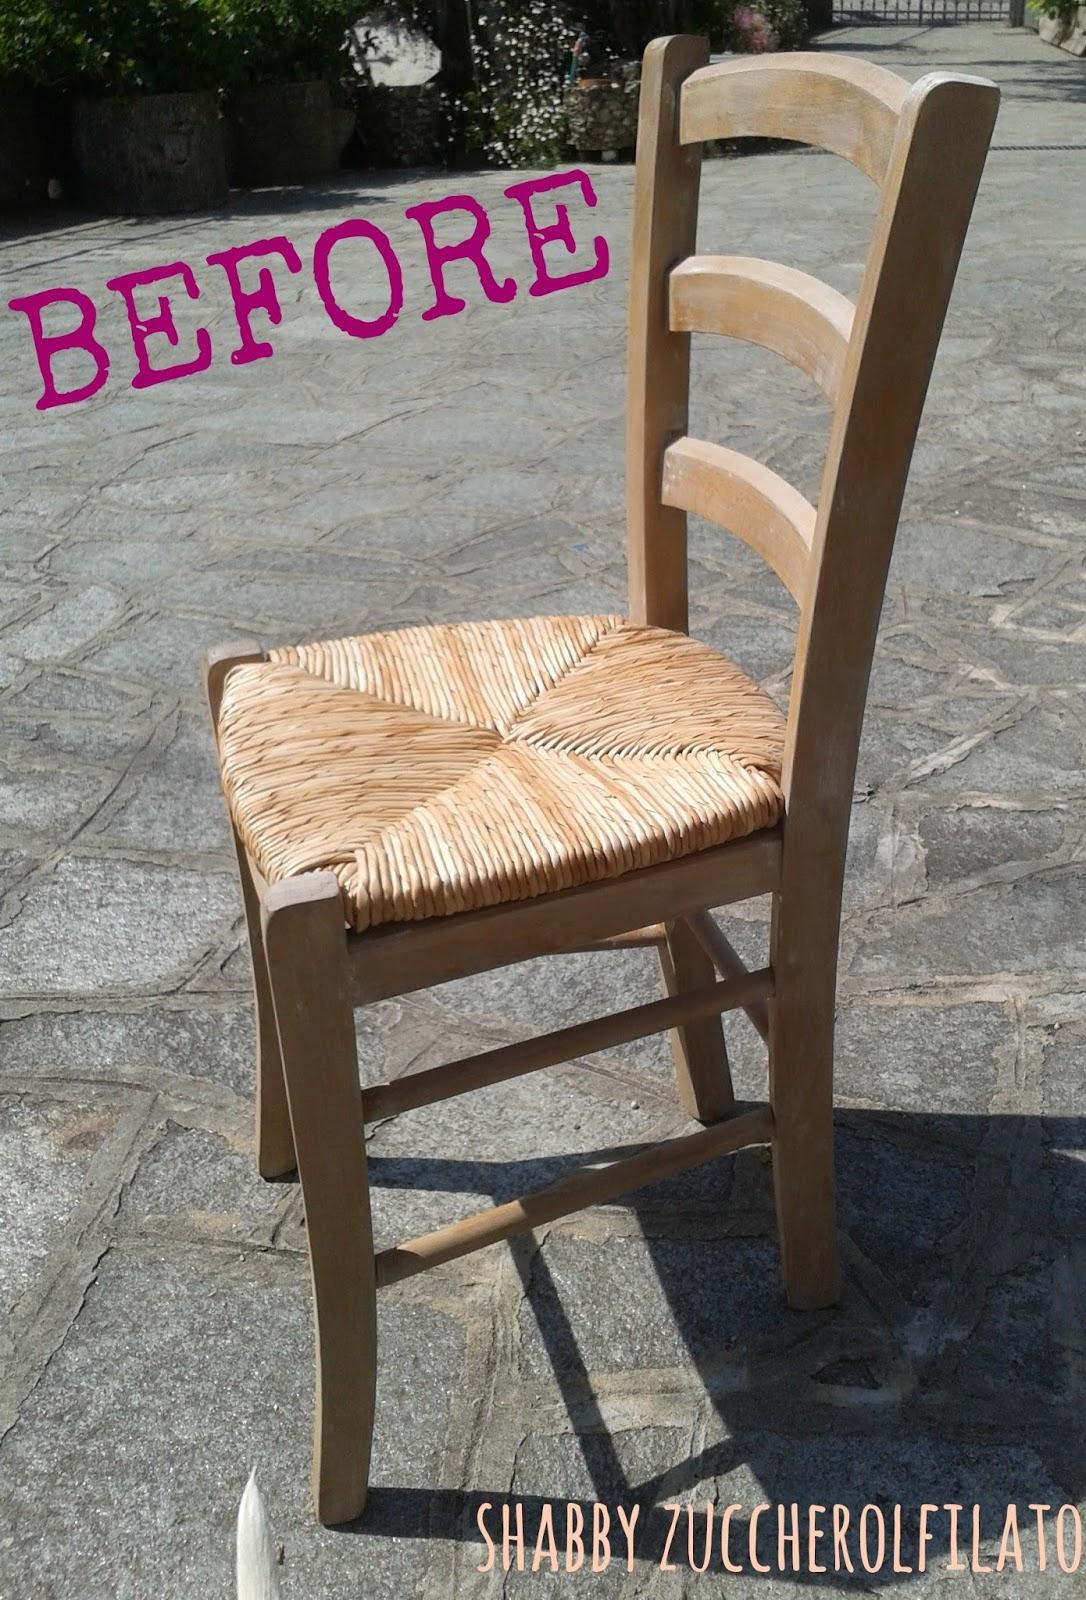 Shabby zuccherofilato coloriamo 4 sedie for Sedie shabby ikea